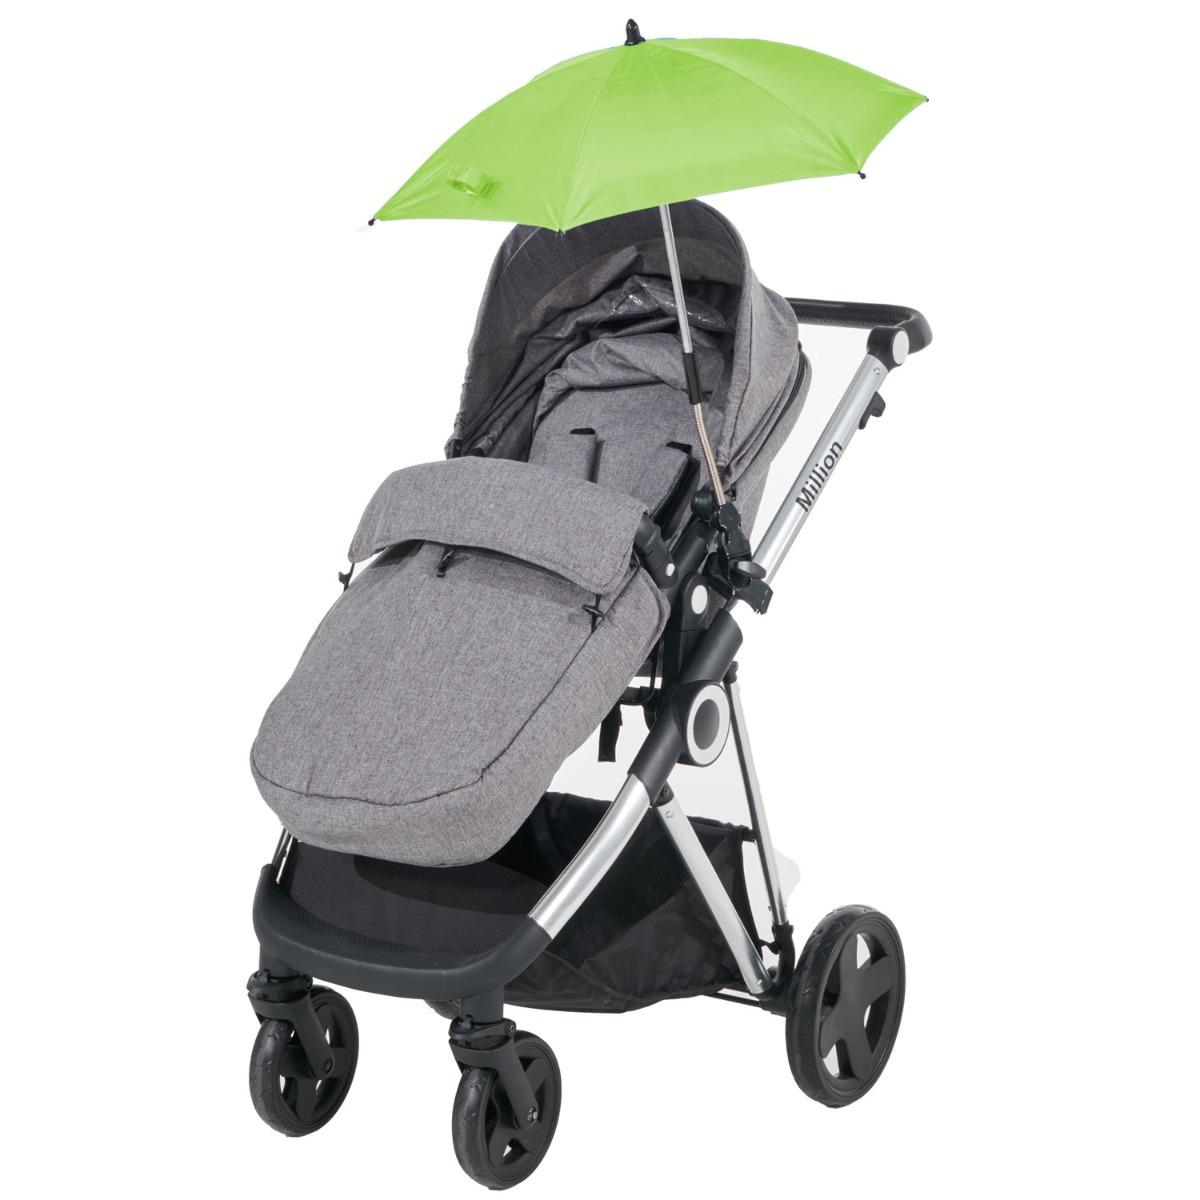 Baby Parasol Umbrella Compatible With Cybex Canopy Protect Sun /& Rain